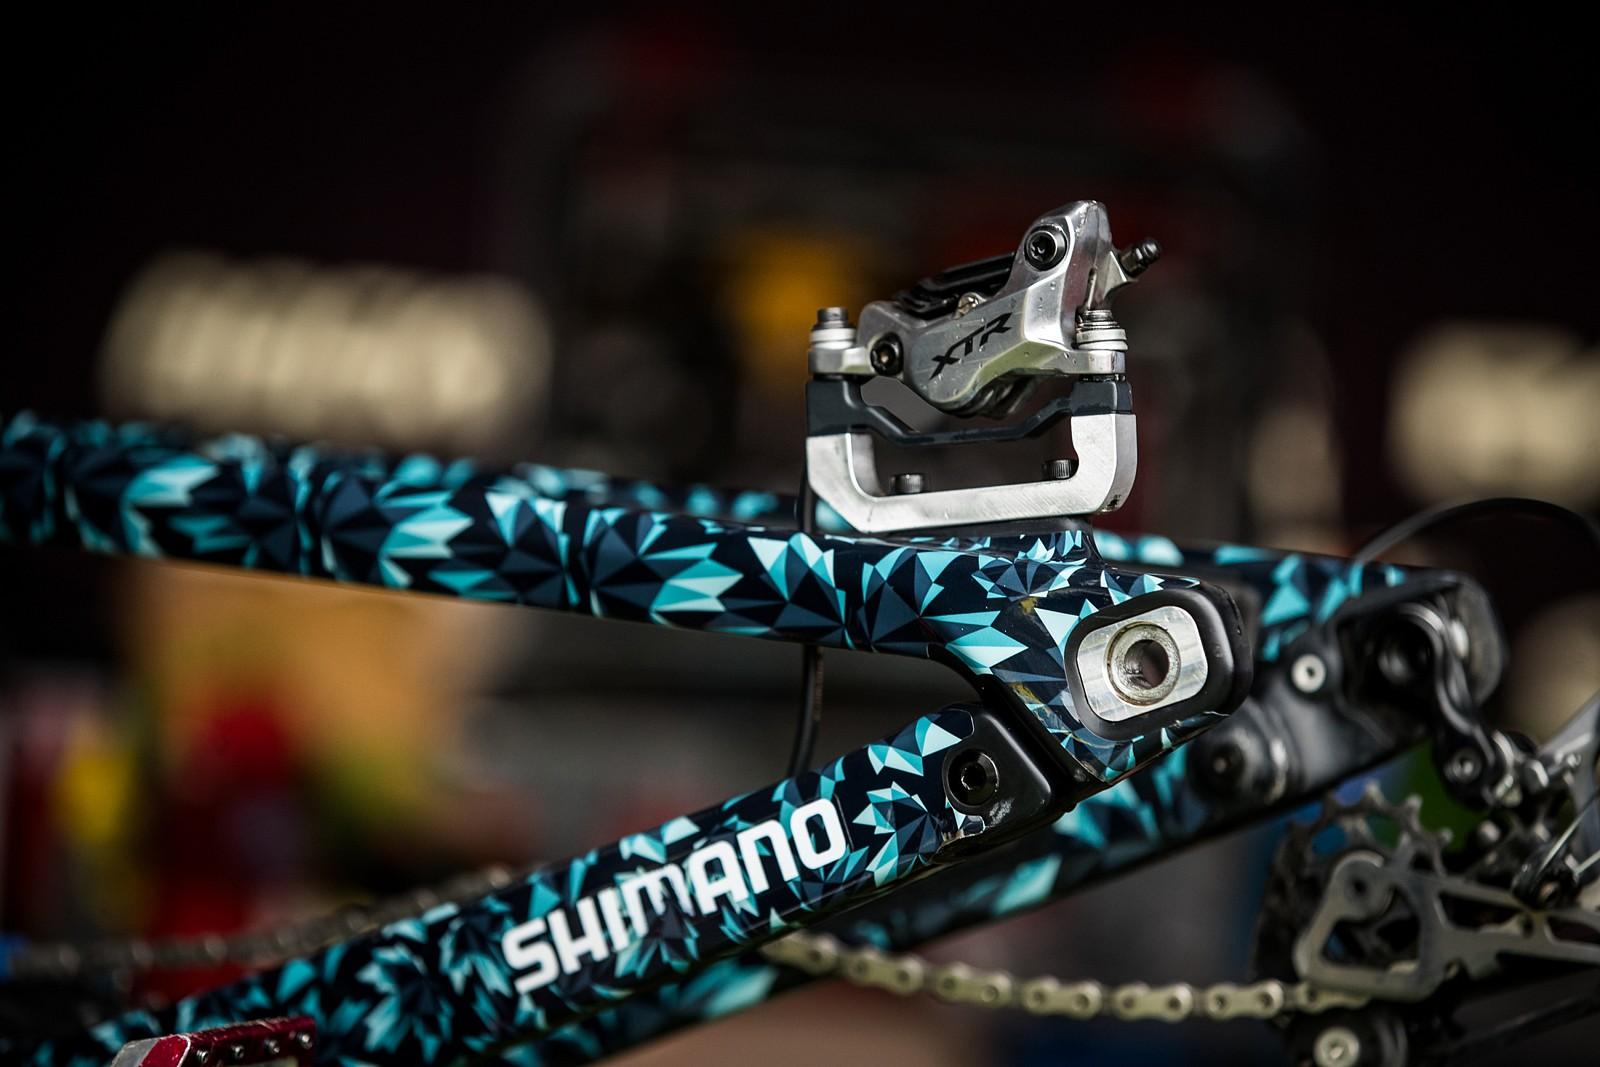 Big Rotors Need Big Adapters - PIT BITS - Enduro World Series, Zermatt - Mountain Biking Pictures - Vital MTB